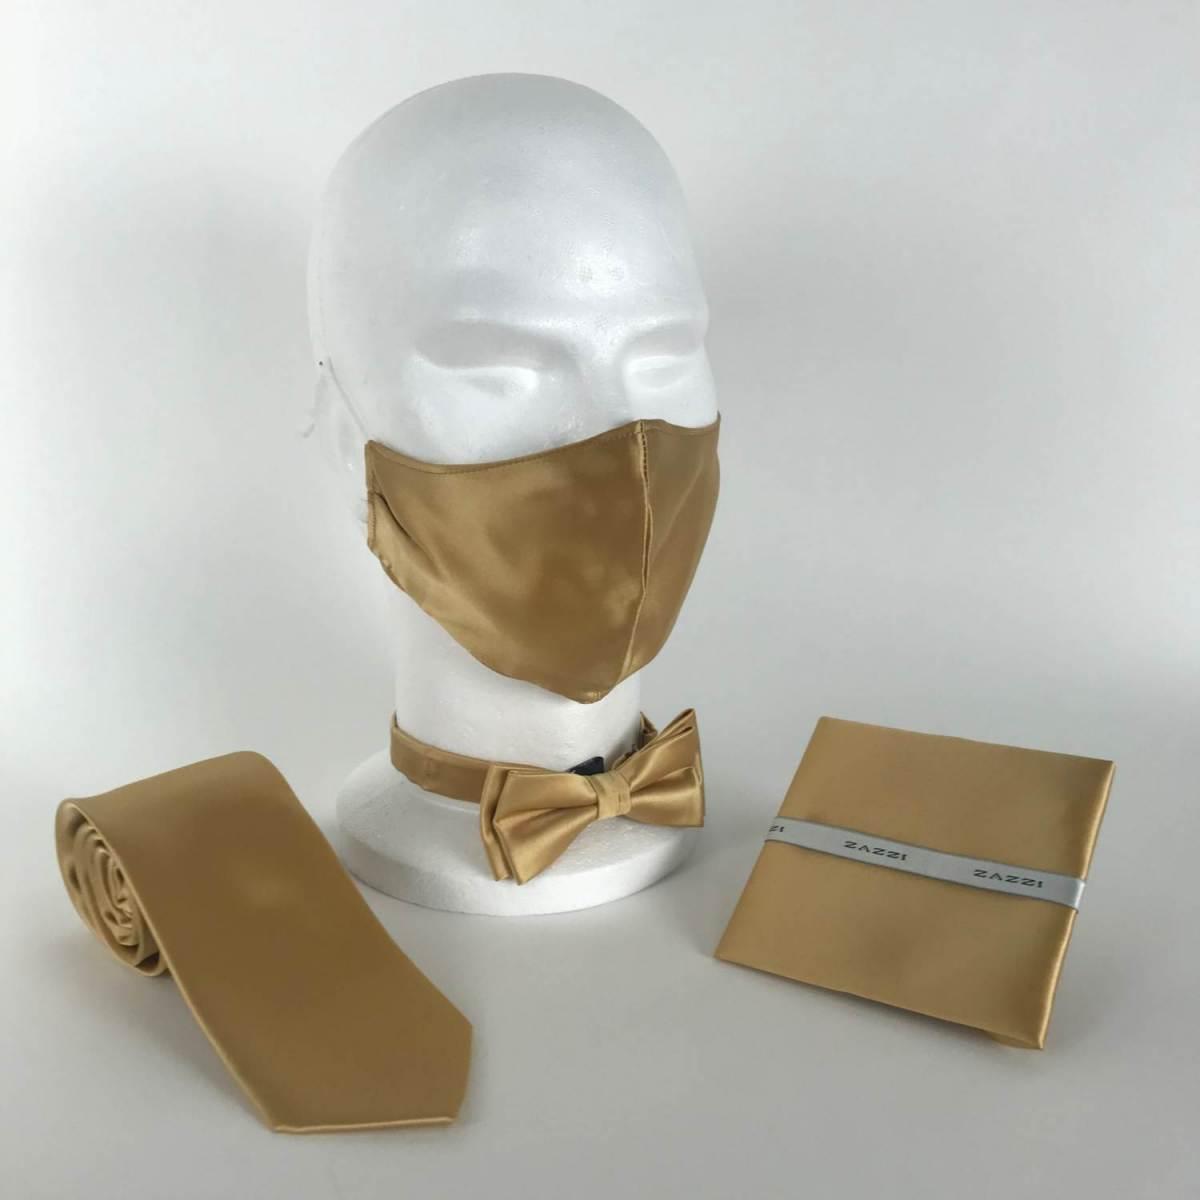 B1764 30 Gold FM. mens ties facemasks con murphys menswear cork scaled - - Con Murphys Menswear